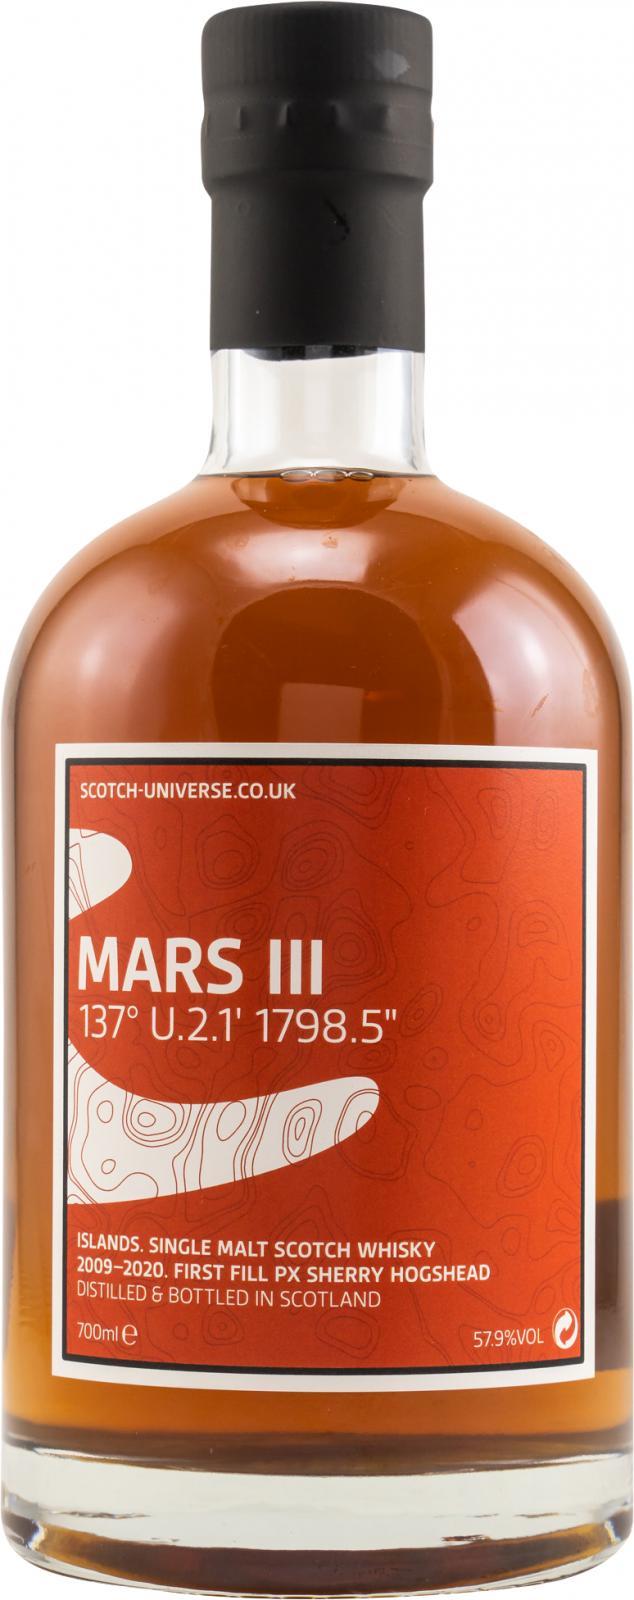 "Scotch Universe Mars III - 137° U.2.1' 1798.5"""